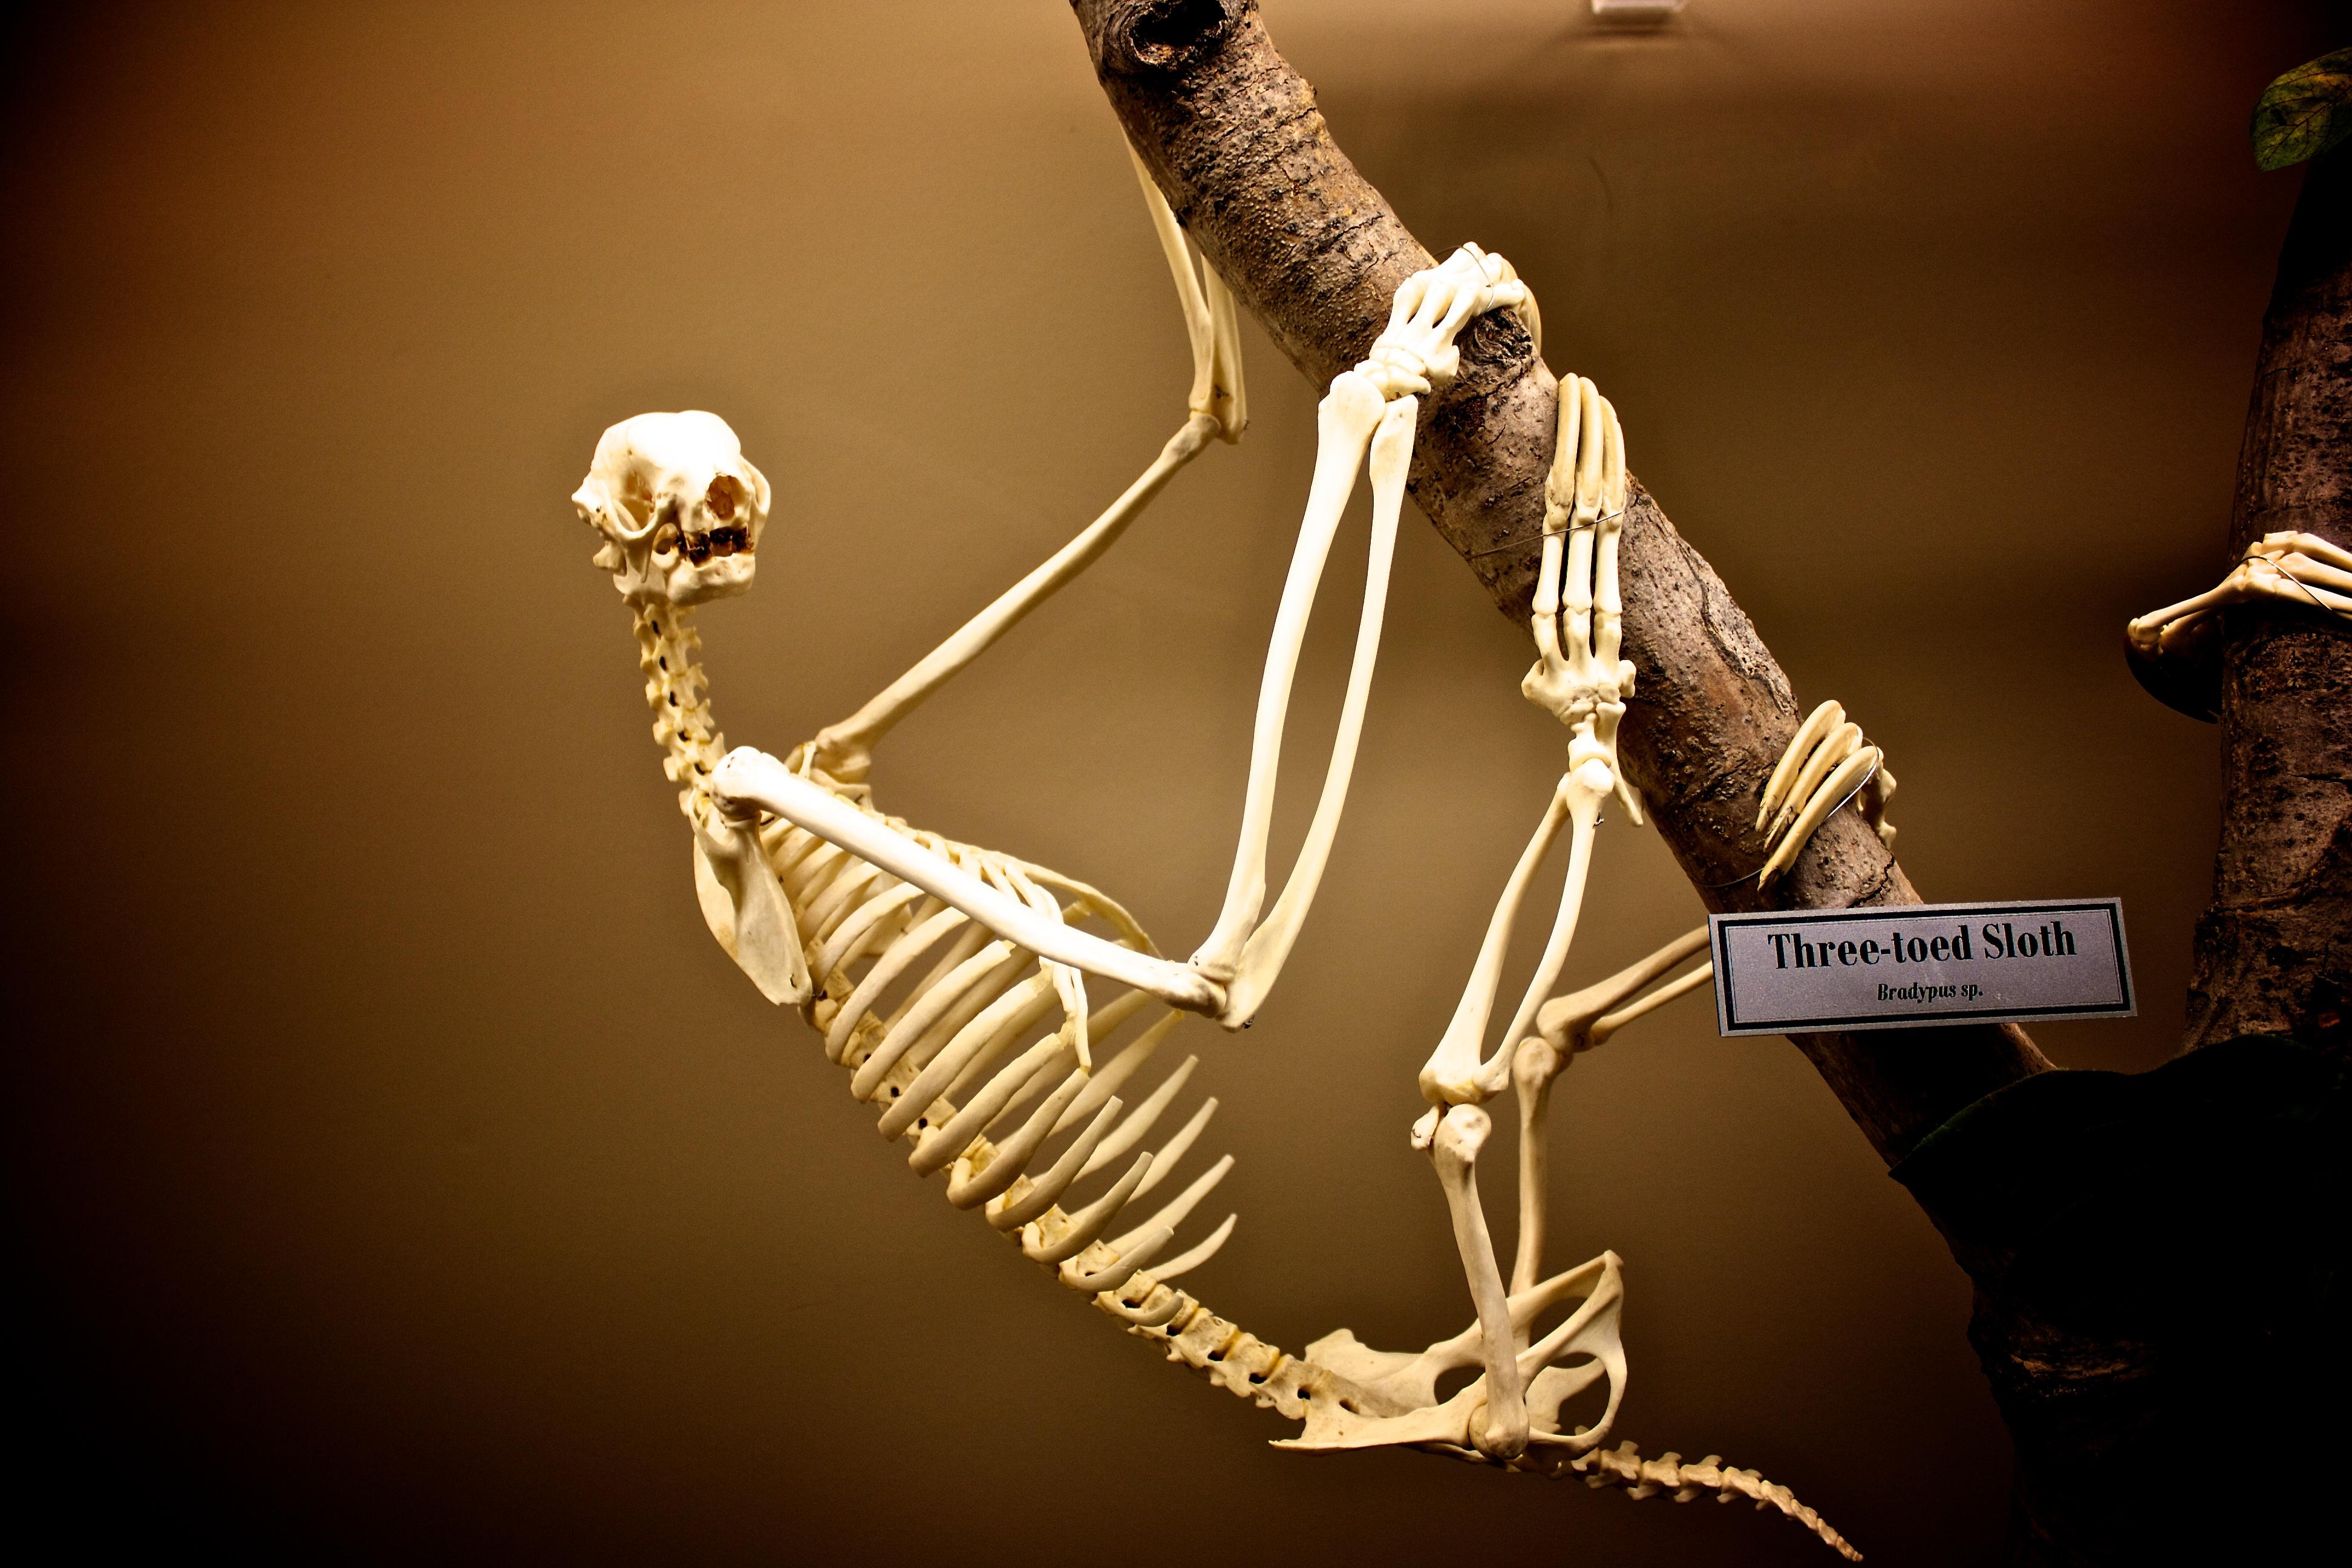 Skeleton_of_a_Three-toed_Sloth